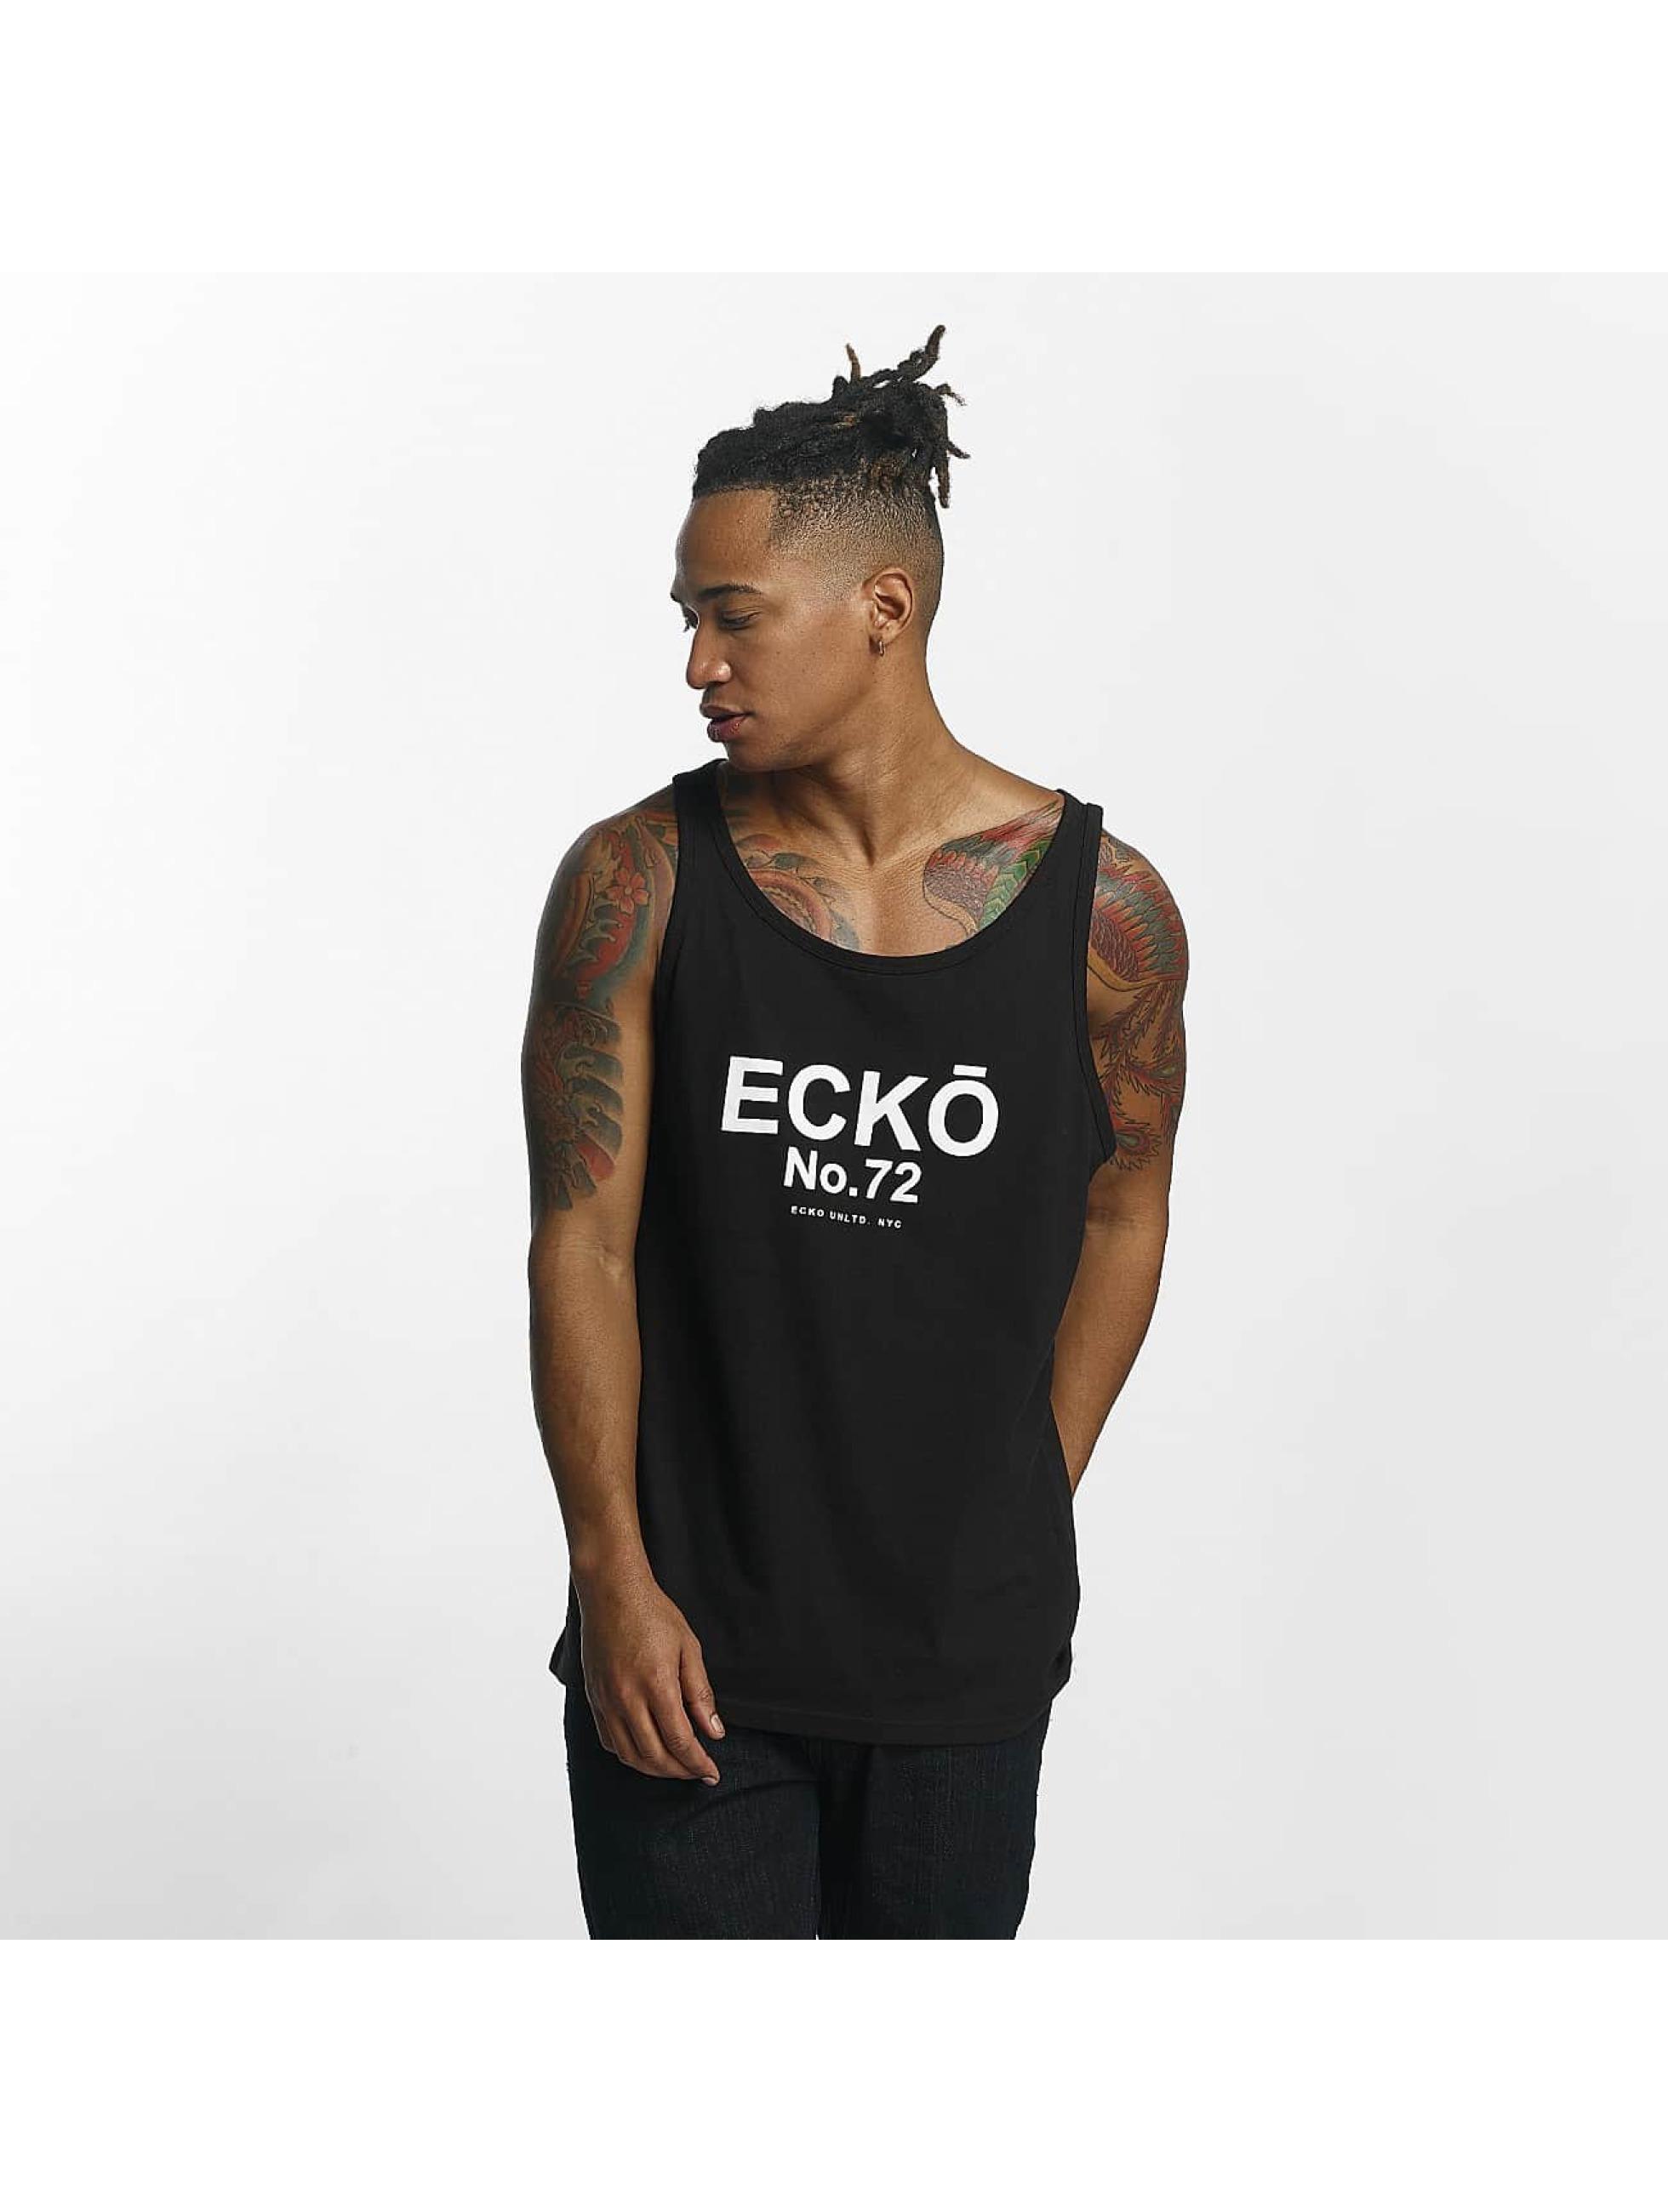 Ecko Unltd. / Tank Tops SkeletonCoast in black M